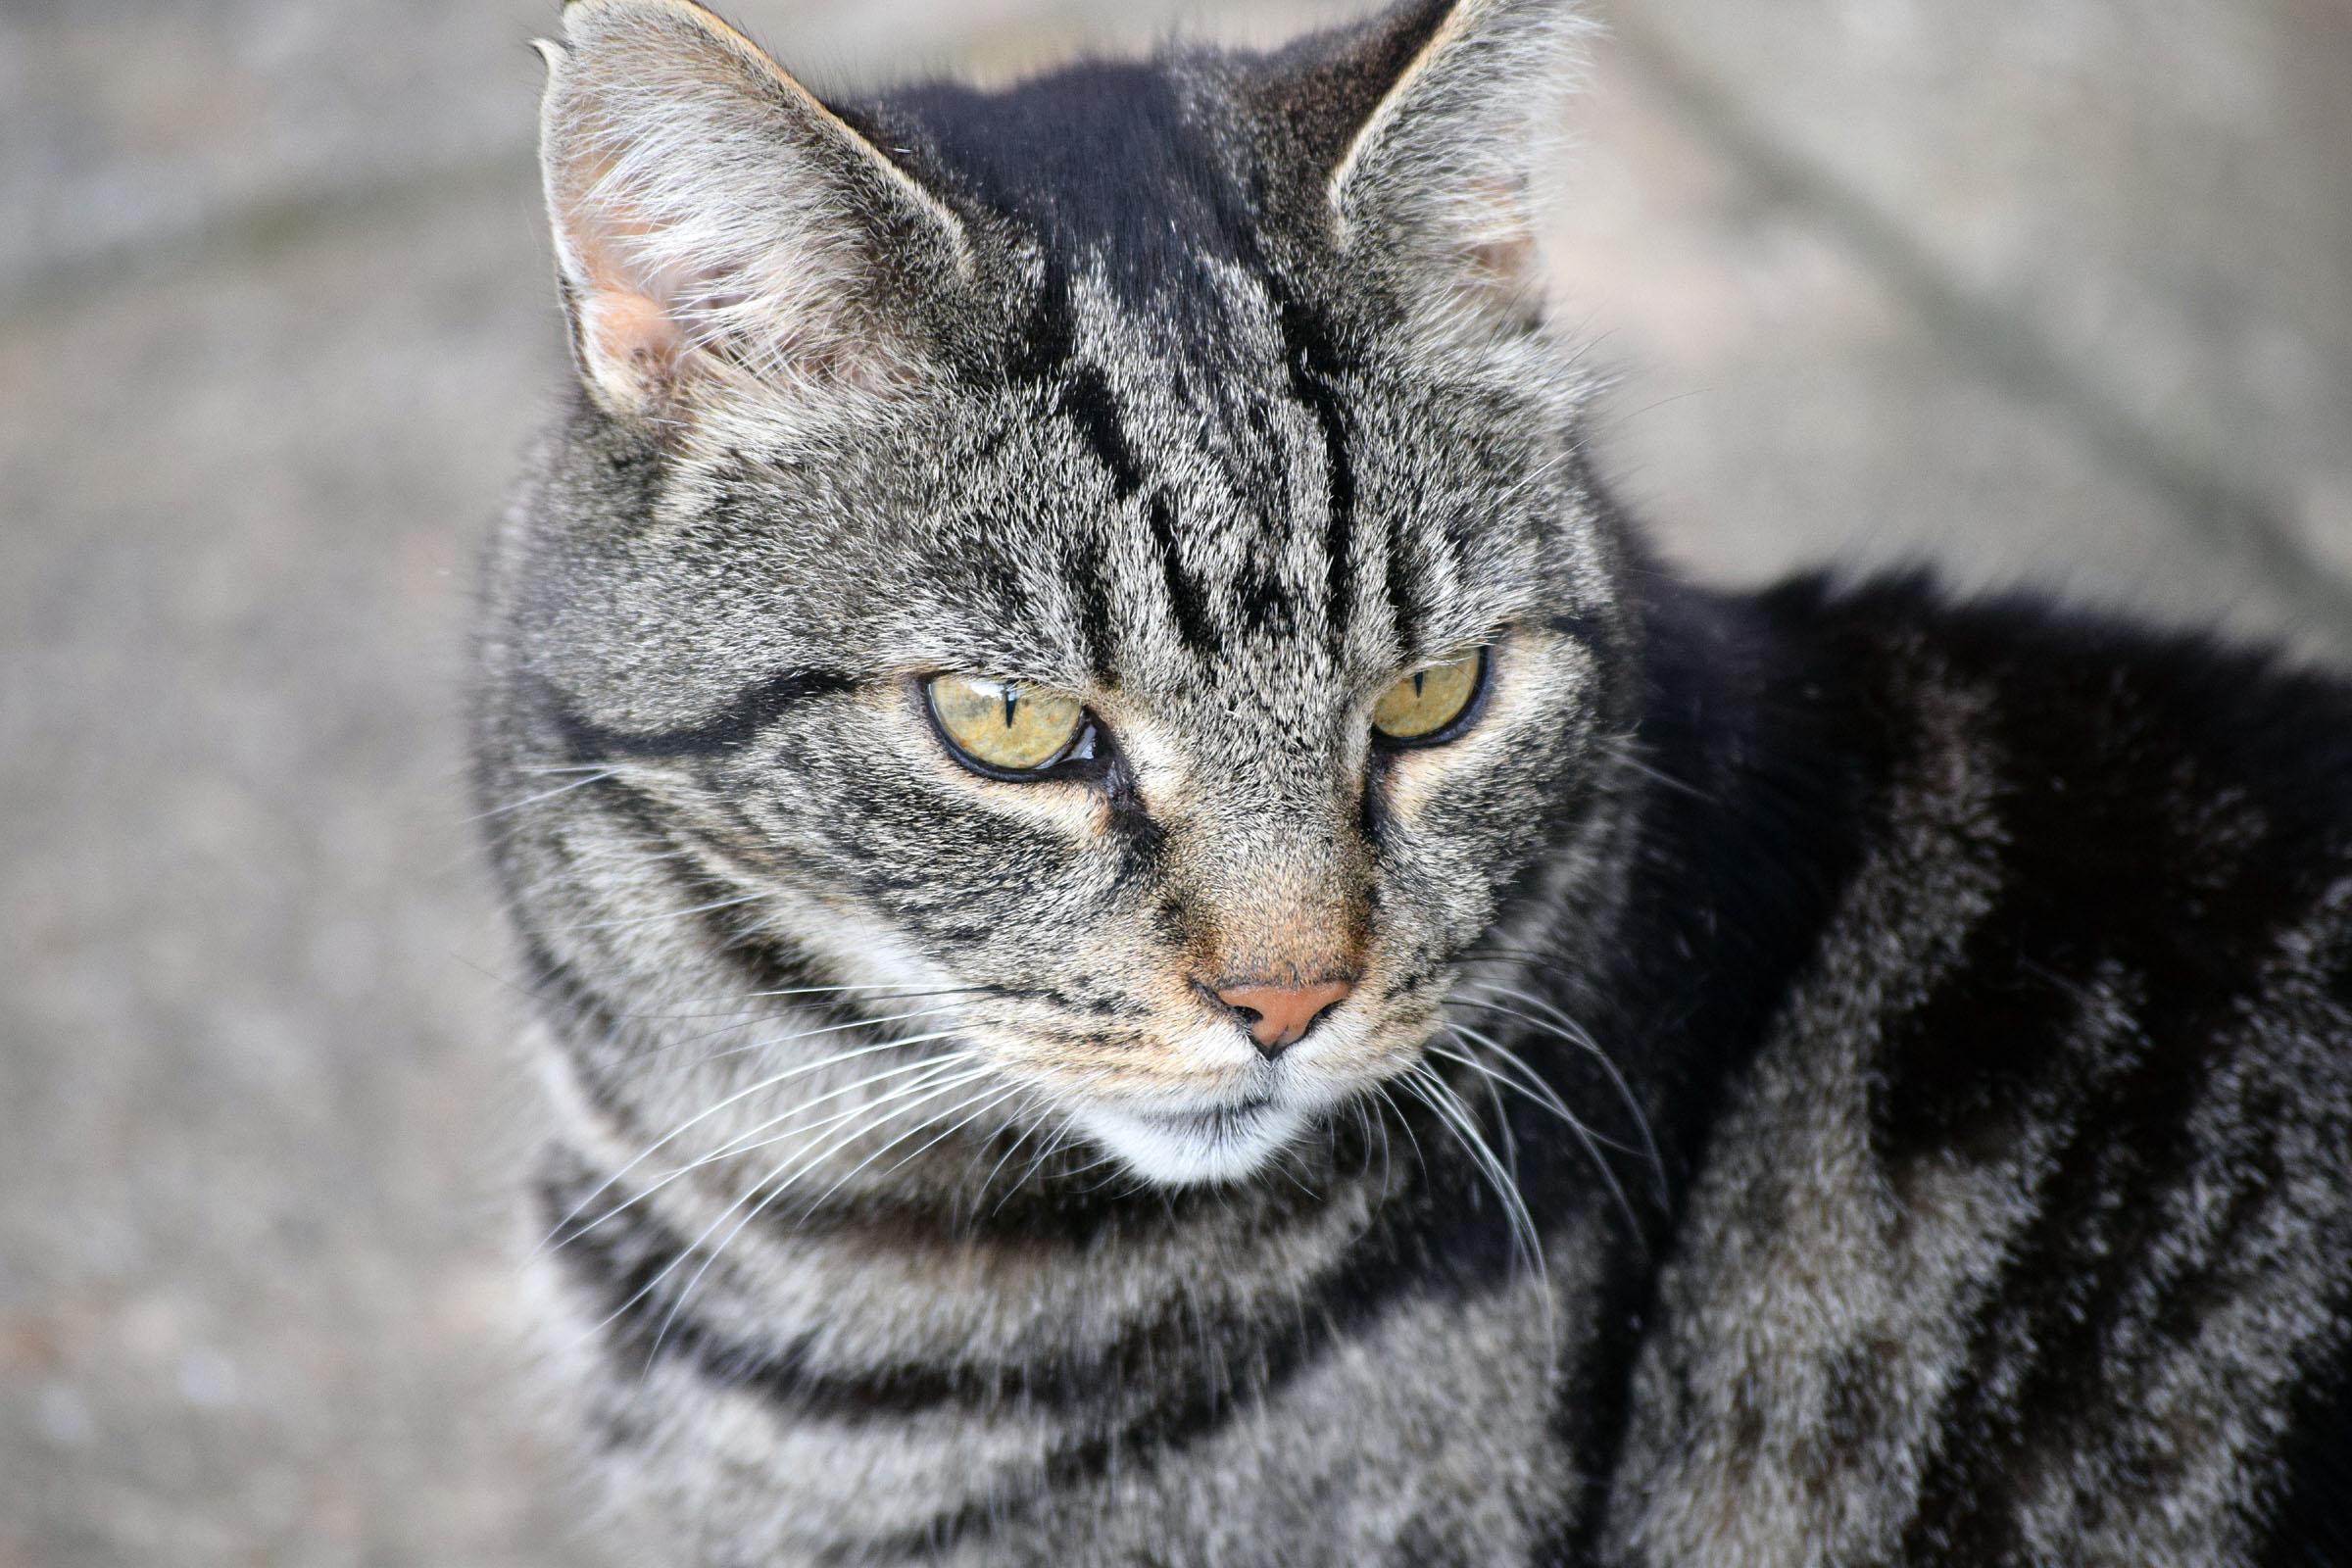 Tabby cat, Cat, Curious, Feline, Furry, HQ Photo